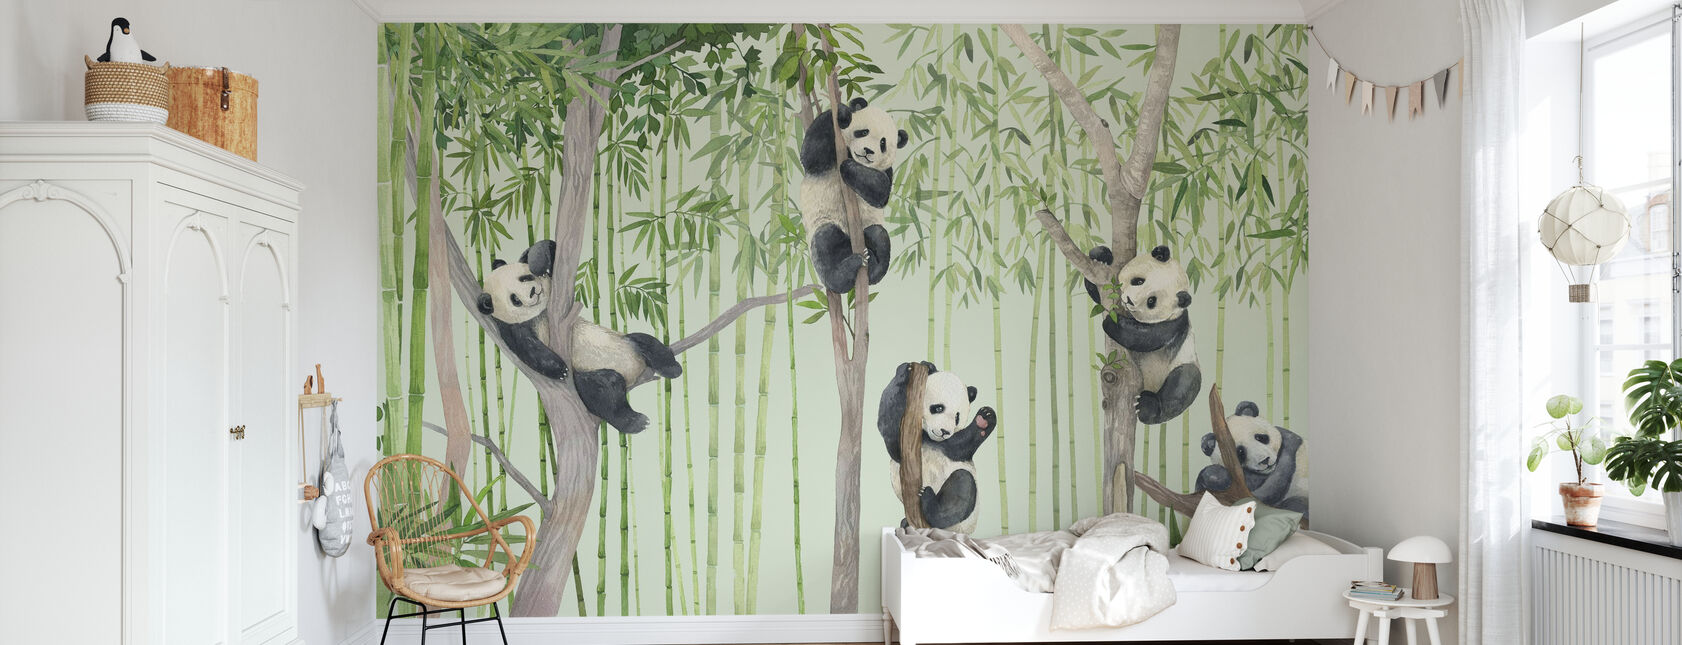 Panda Friends - Wallpaper - Kids Room